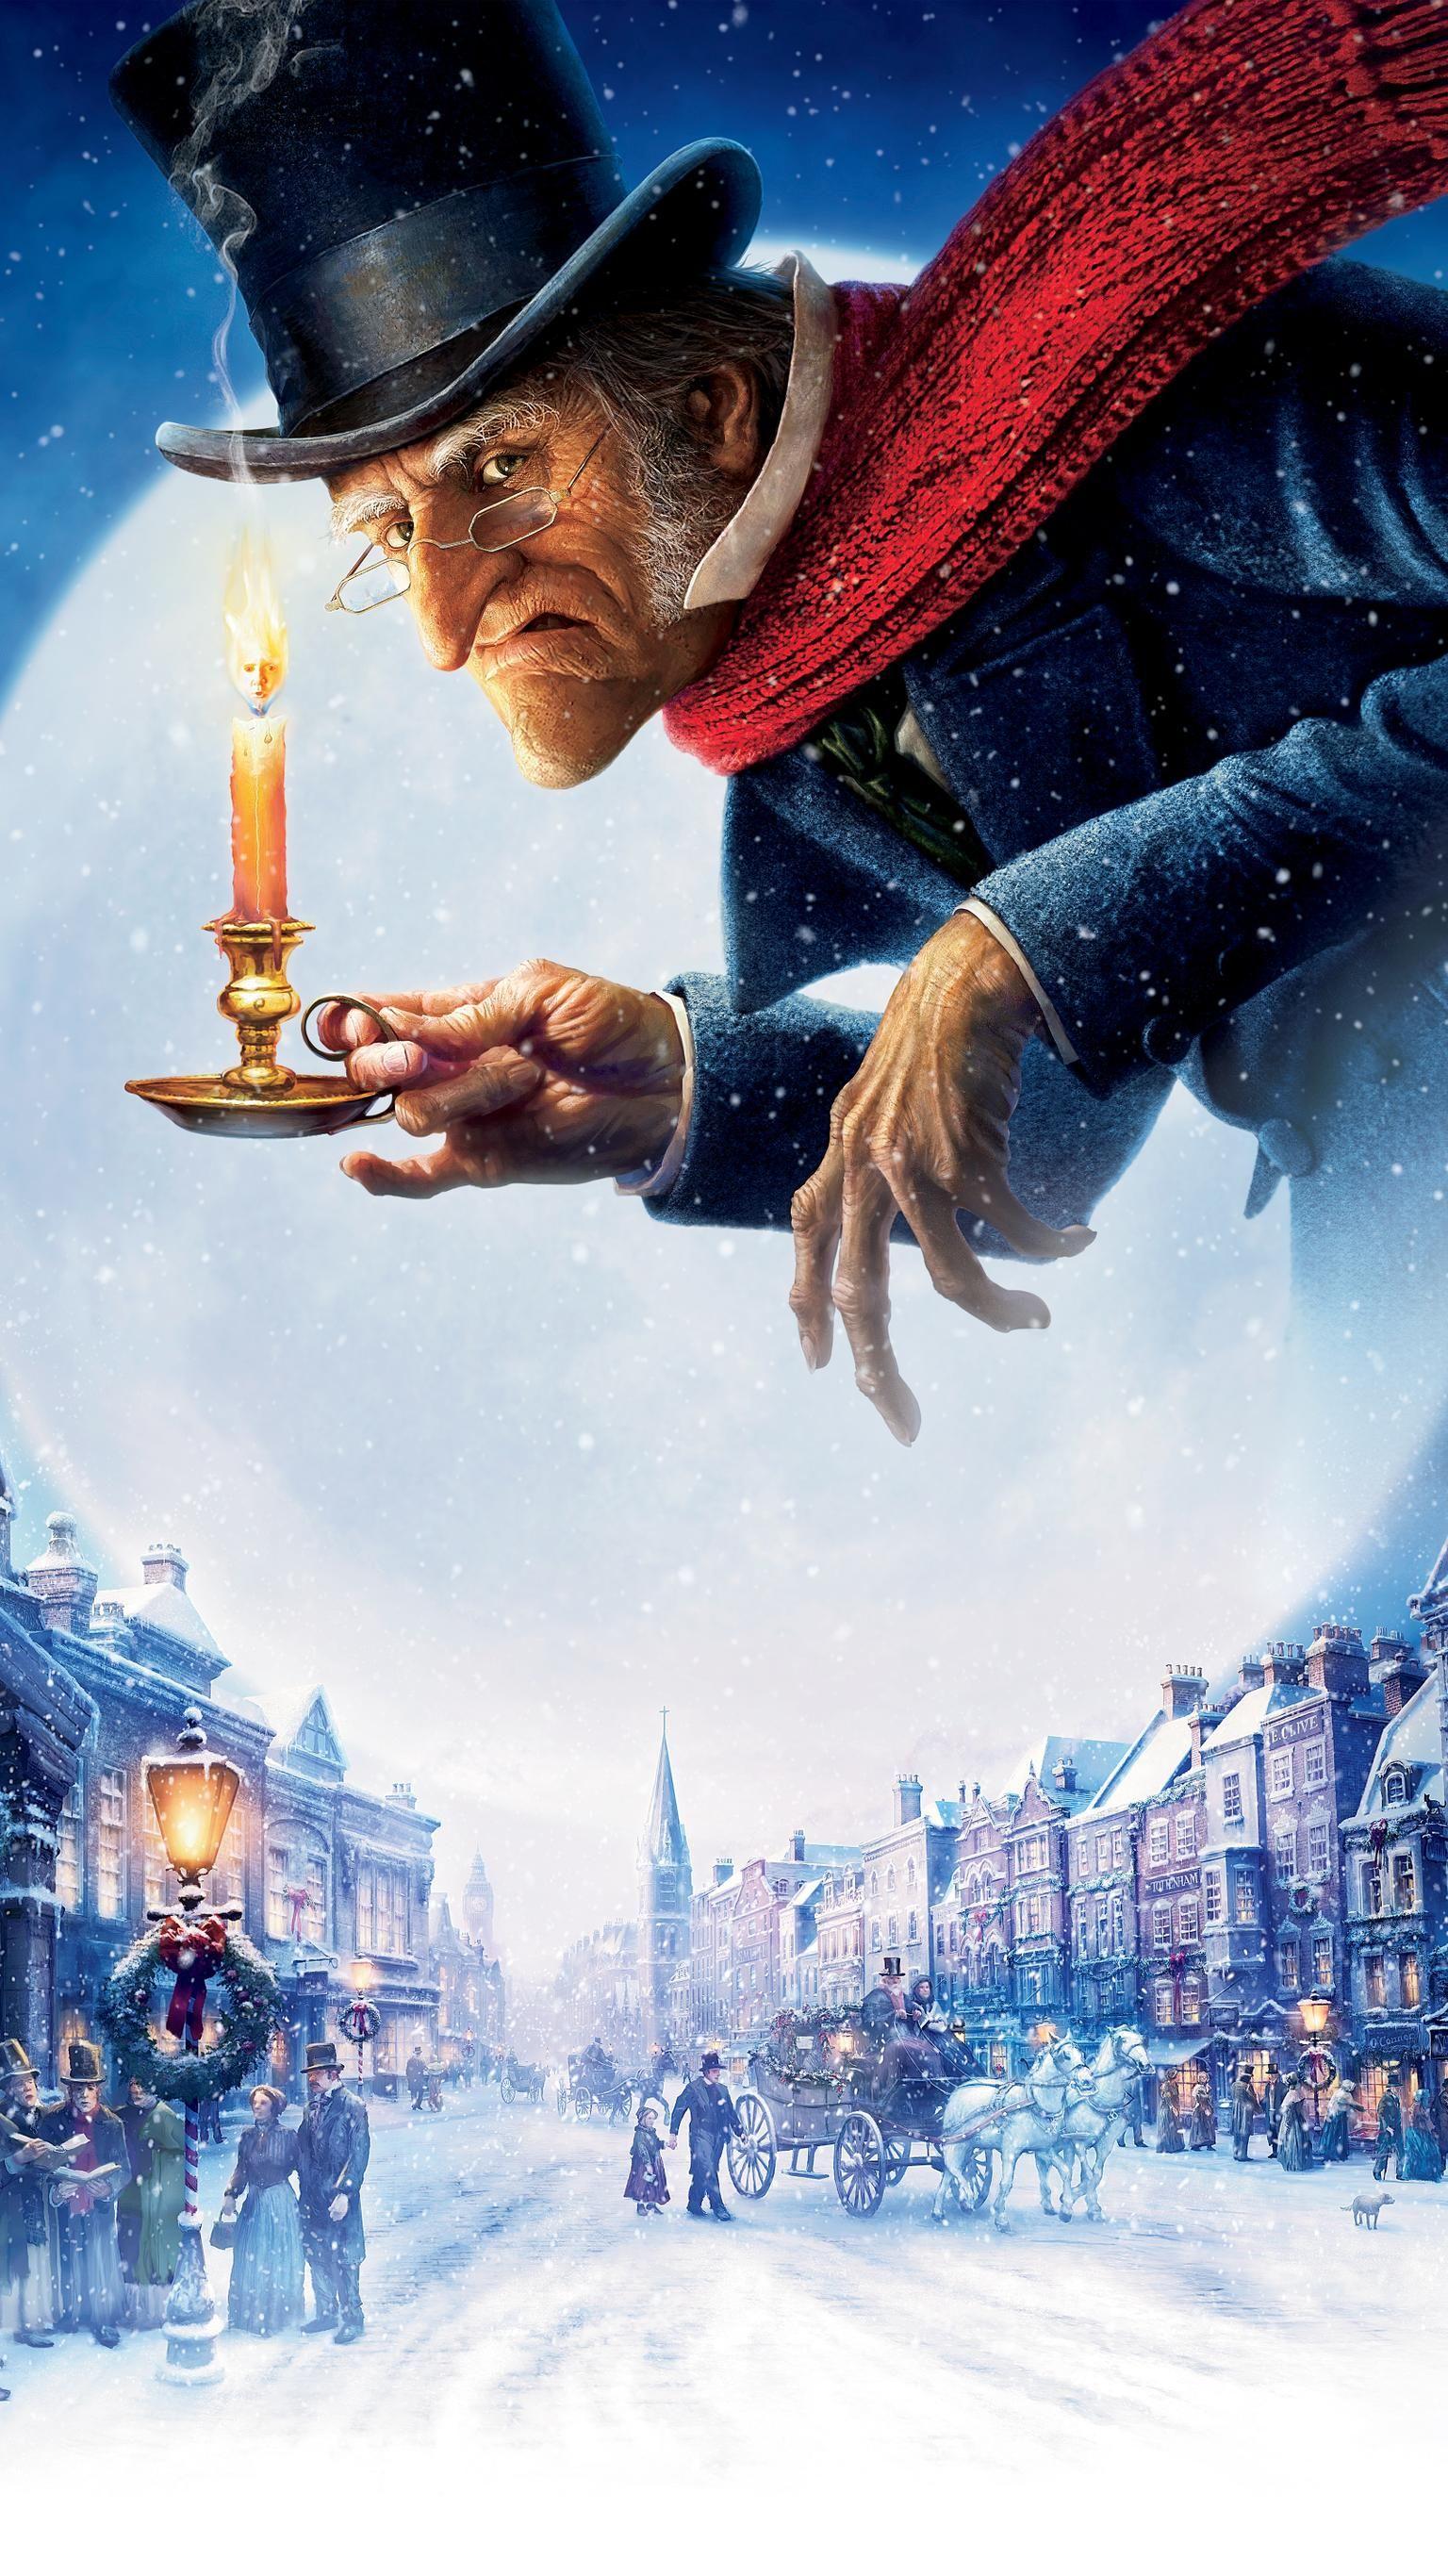 A Christmas Carol (2009) Phone Wallpaper | Moviemania